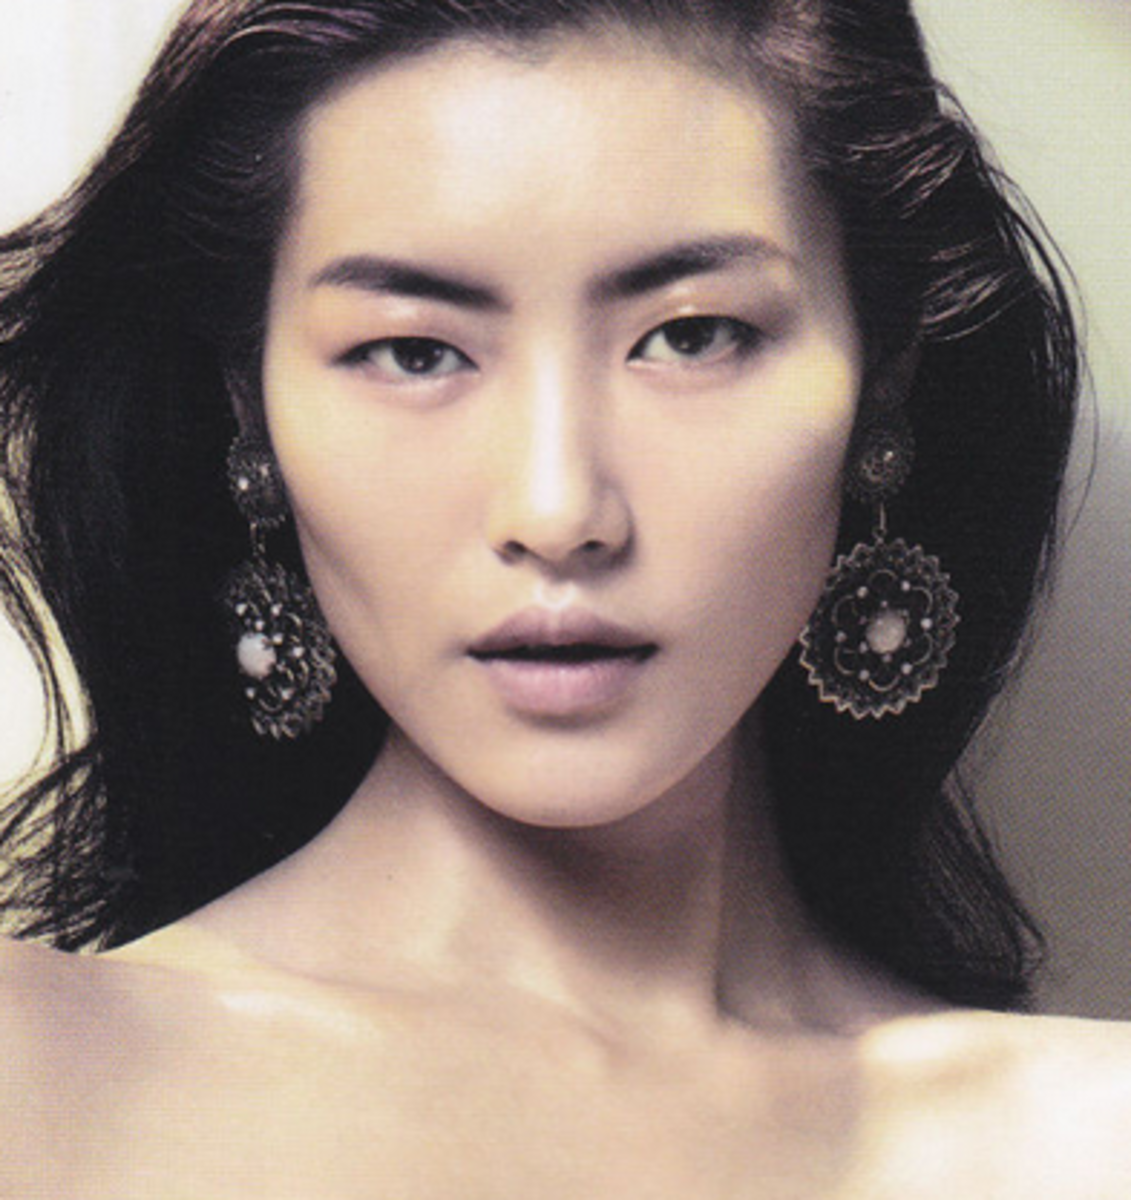 Asian Eye Makeup Tips: The Natural Look